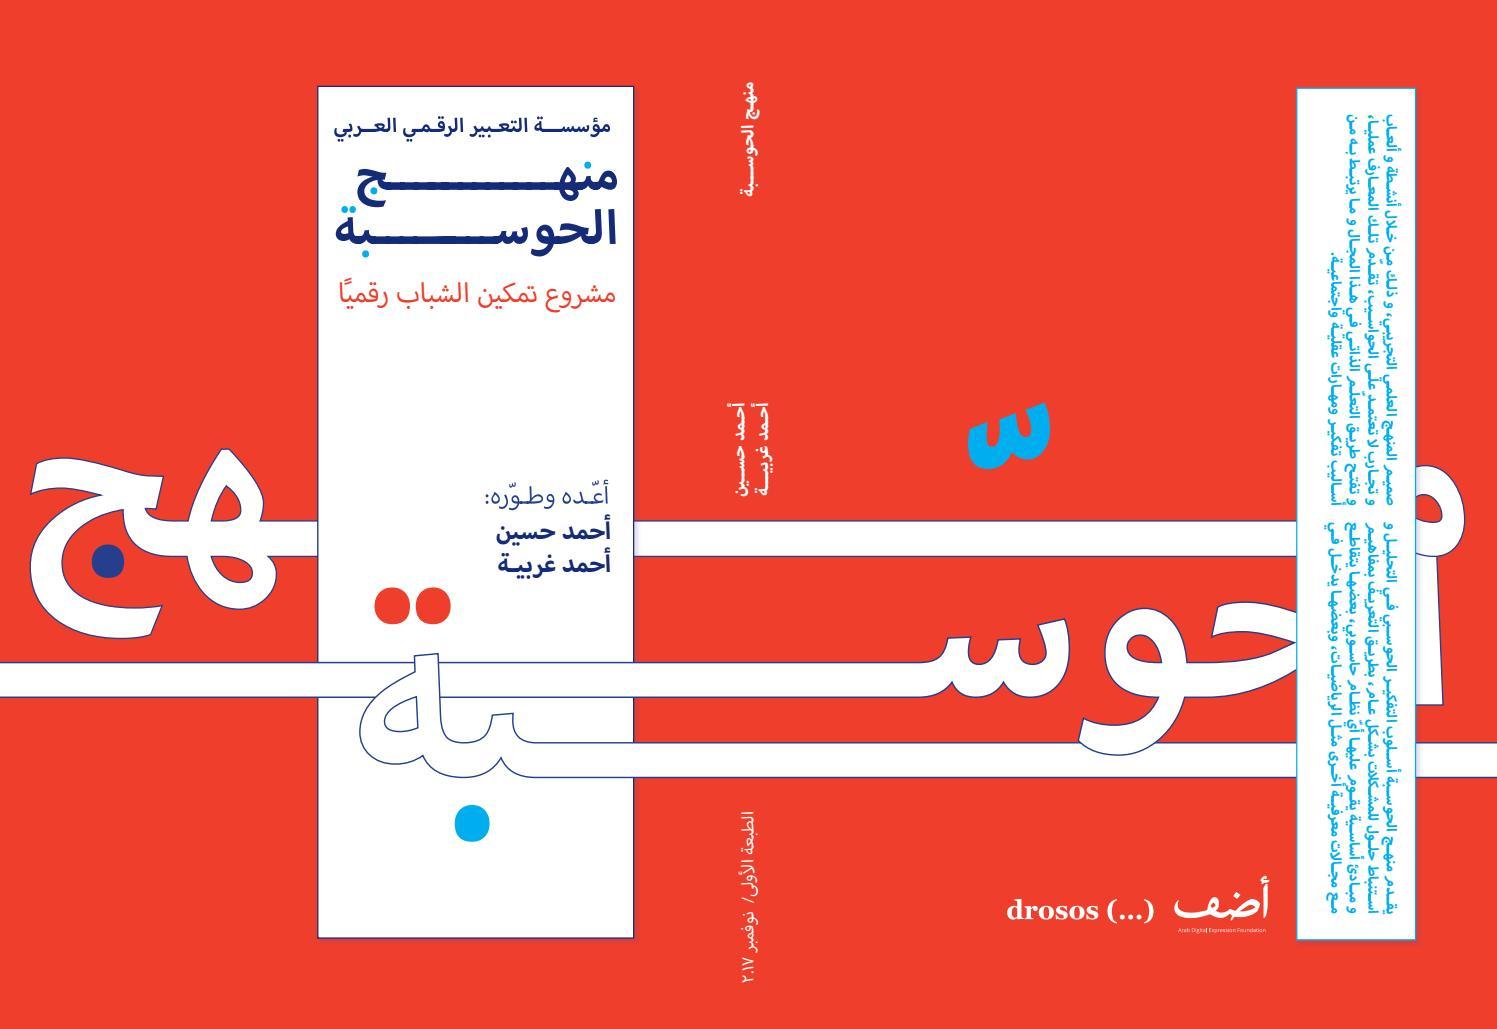 bc98d447f Computational Thinking Curriculum منهج التفكير الحوسبي by ADEF - issuu